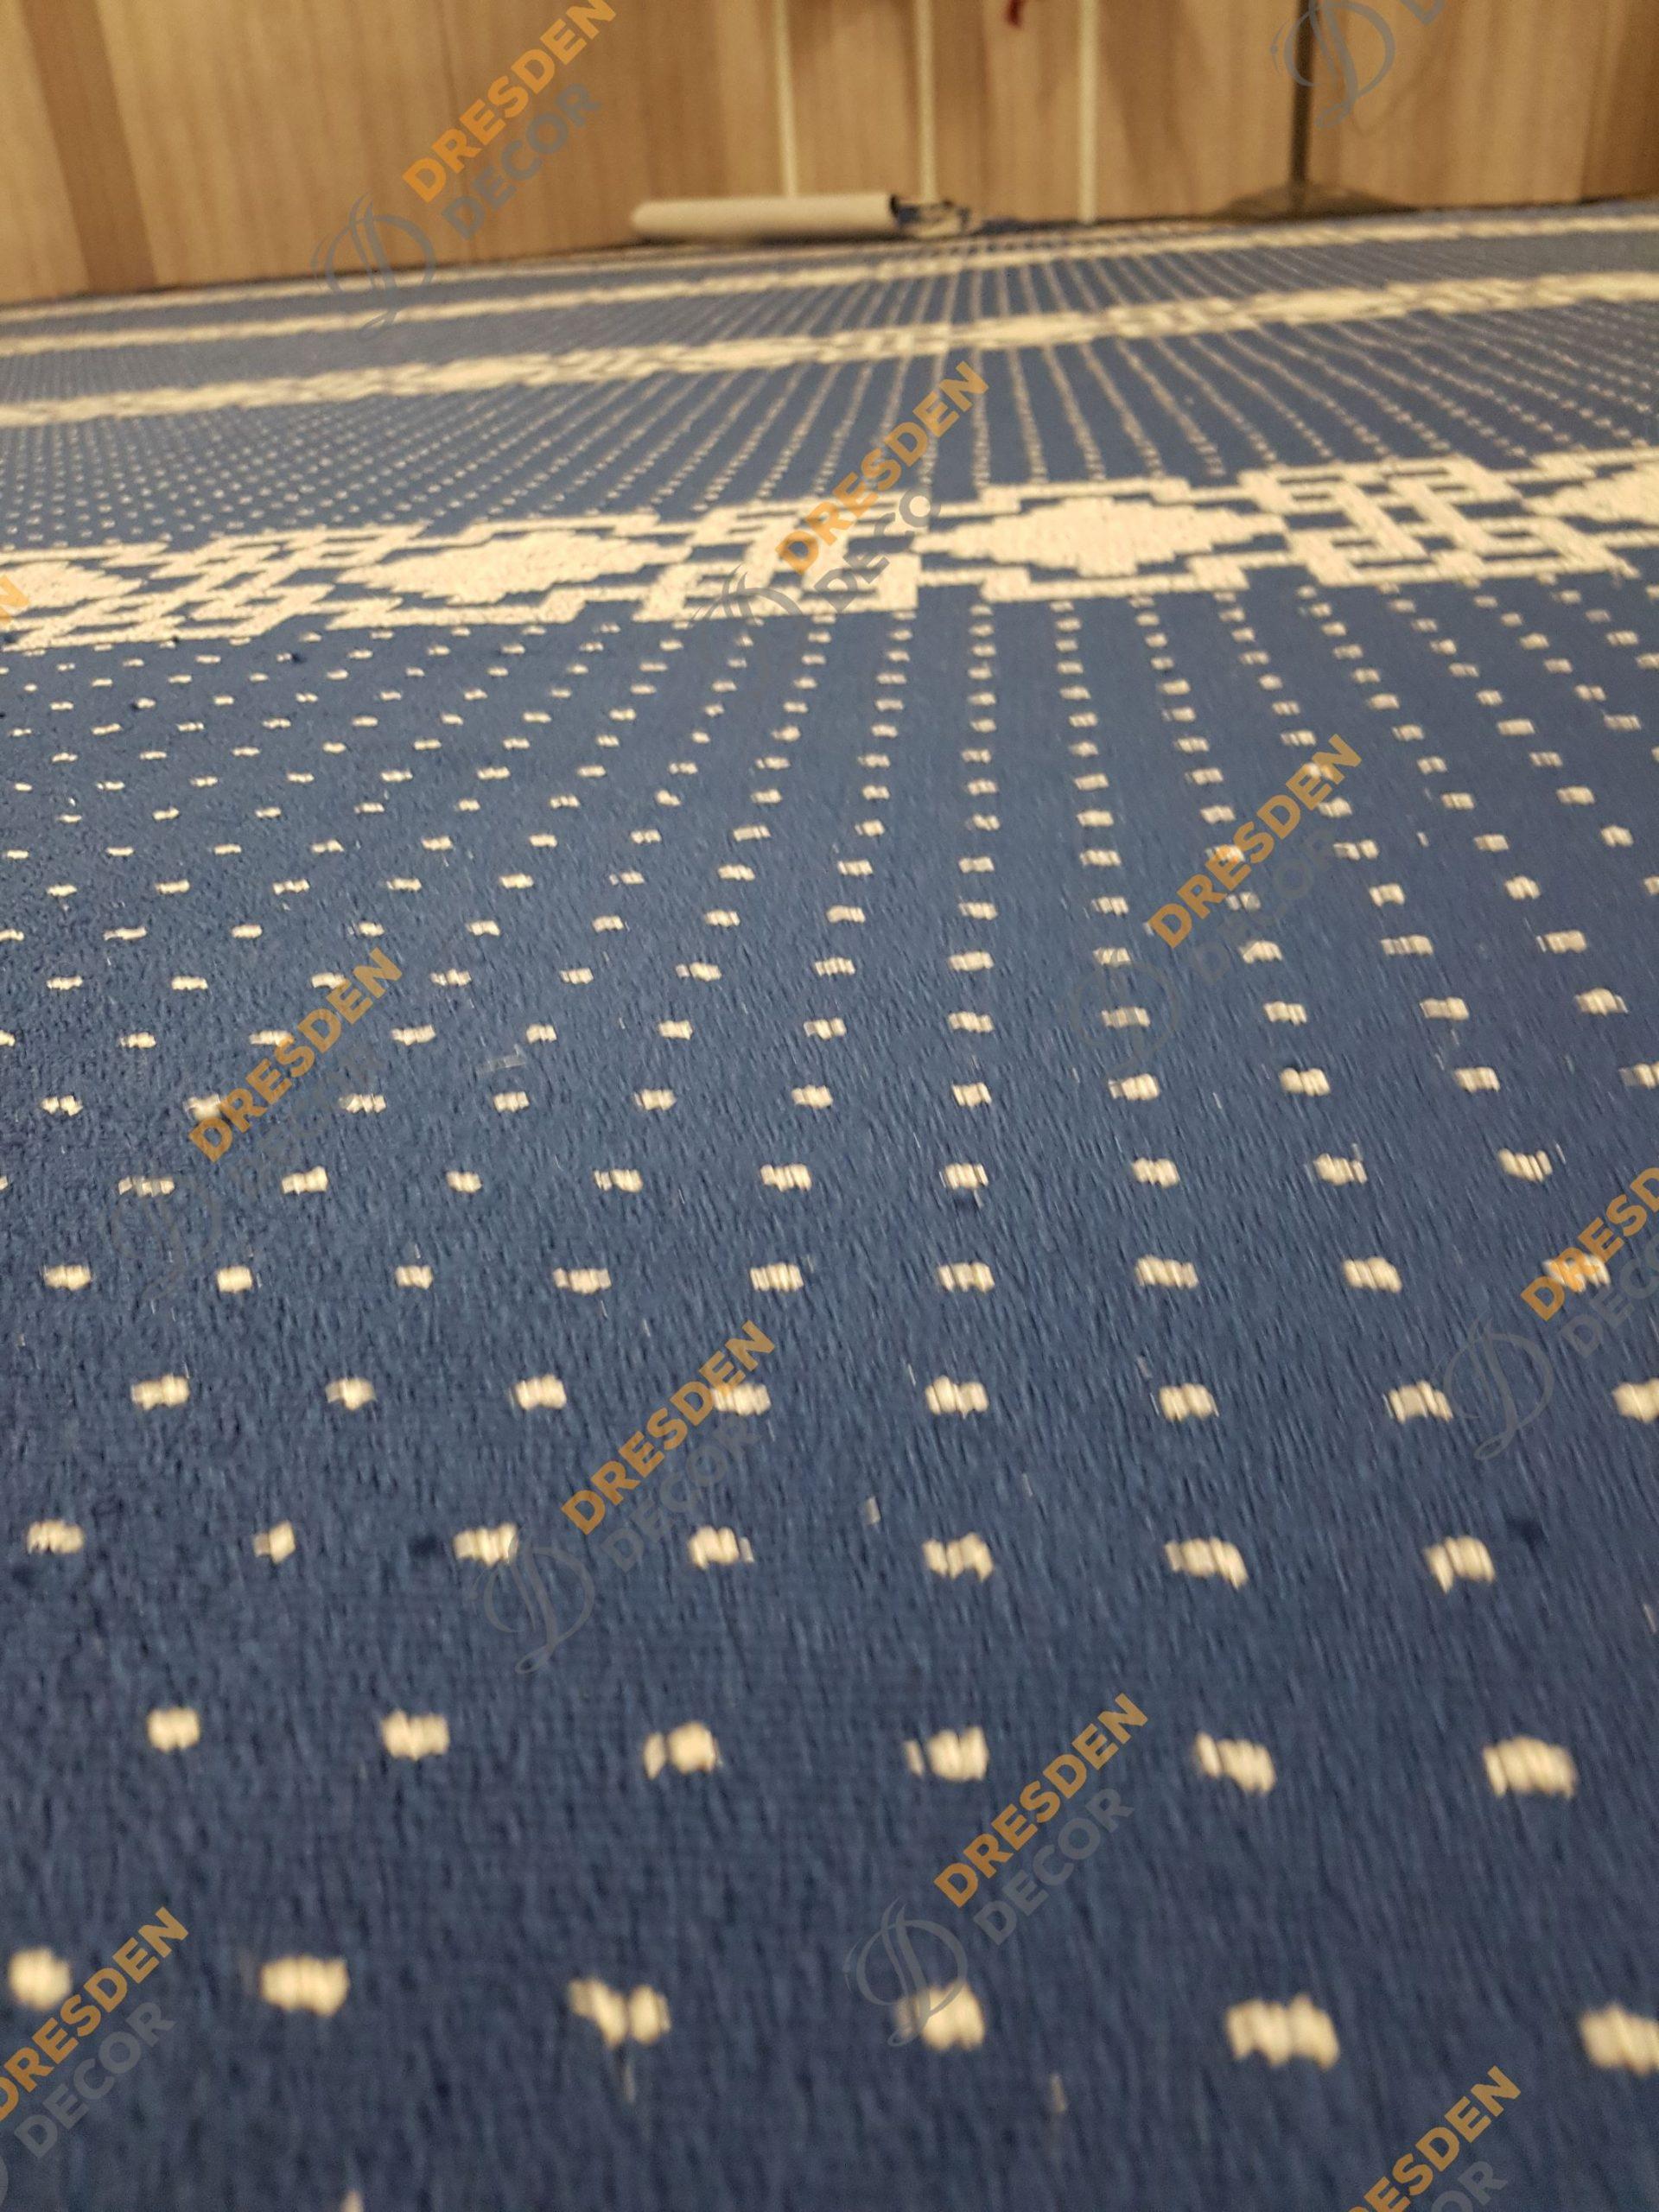 D'Pulze Shopping Center- Surau Carpet